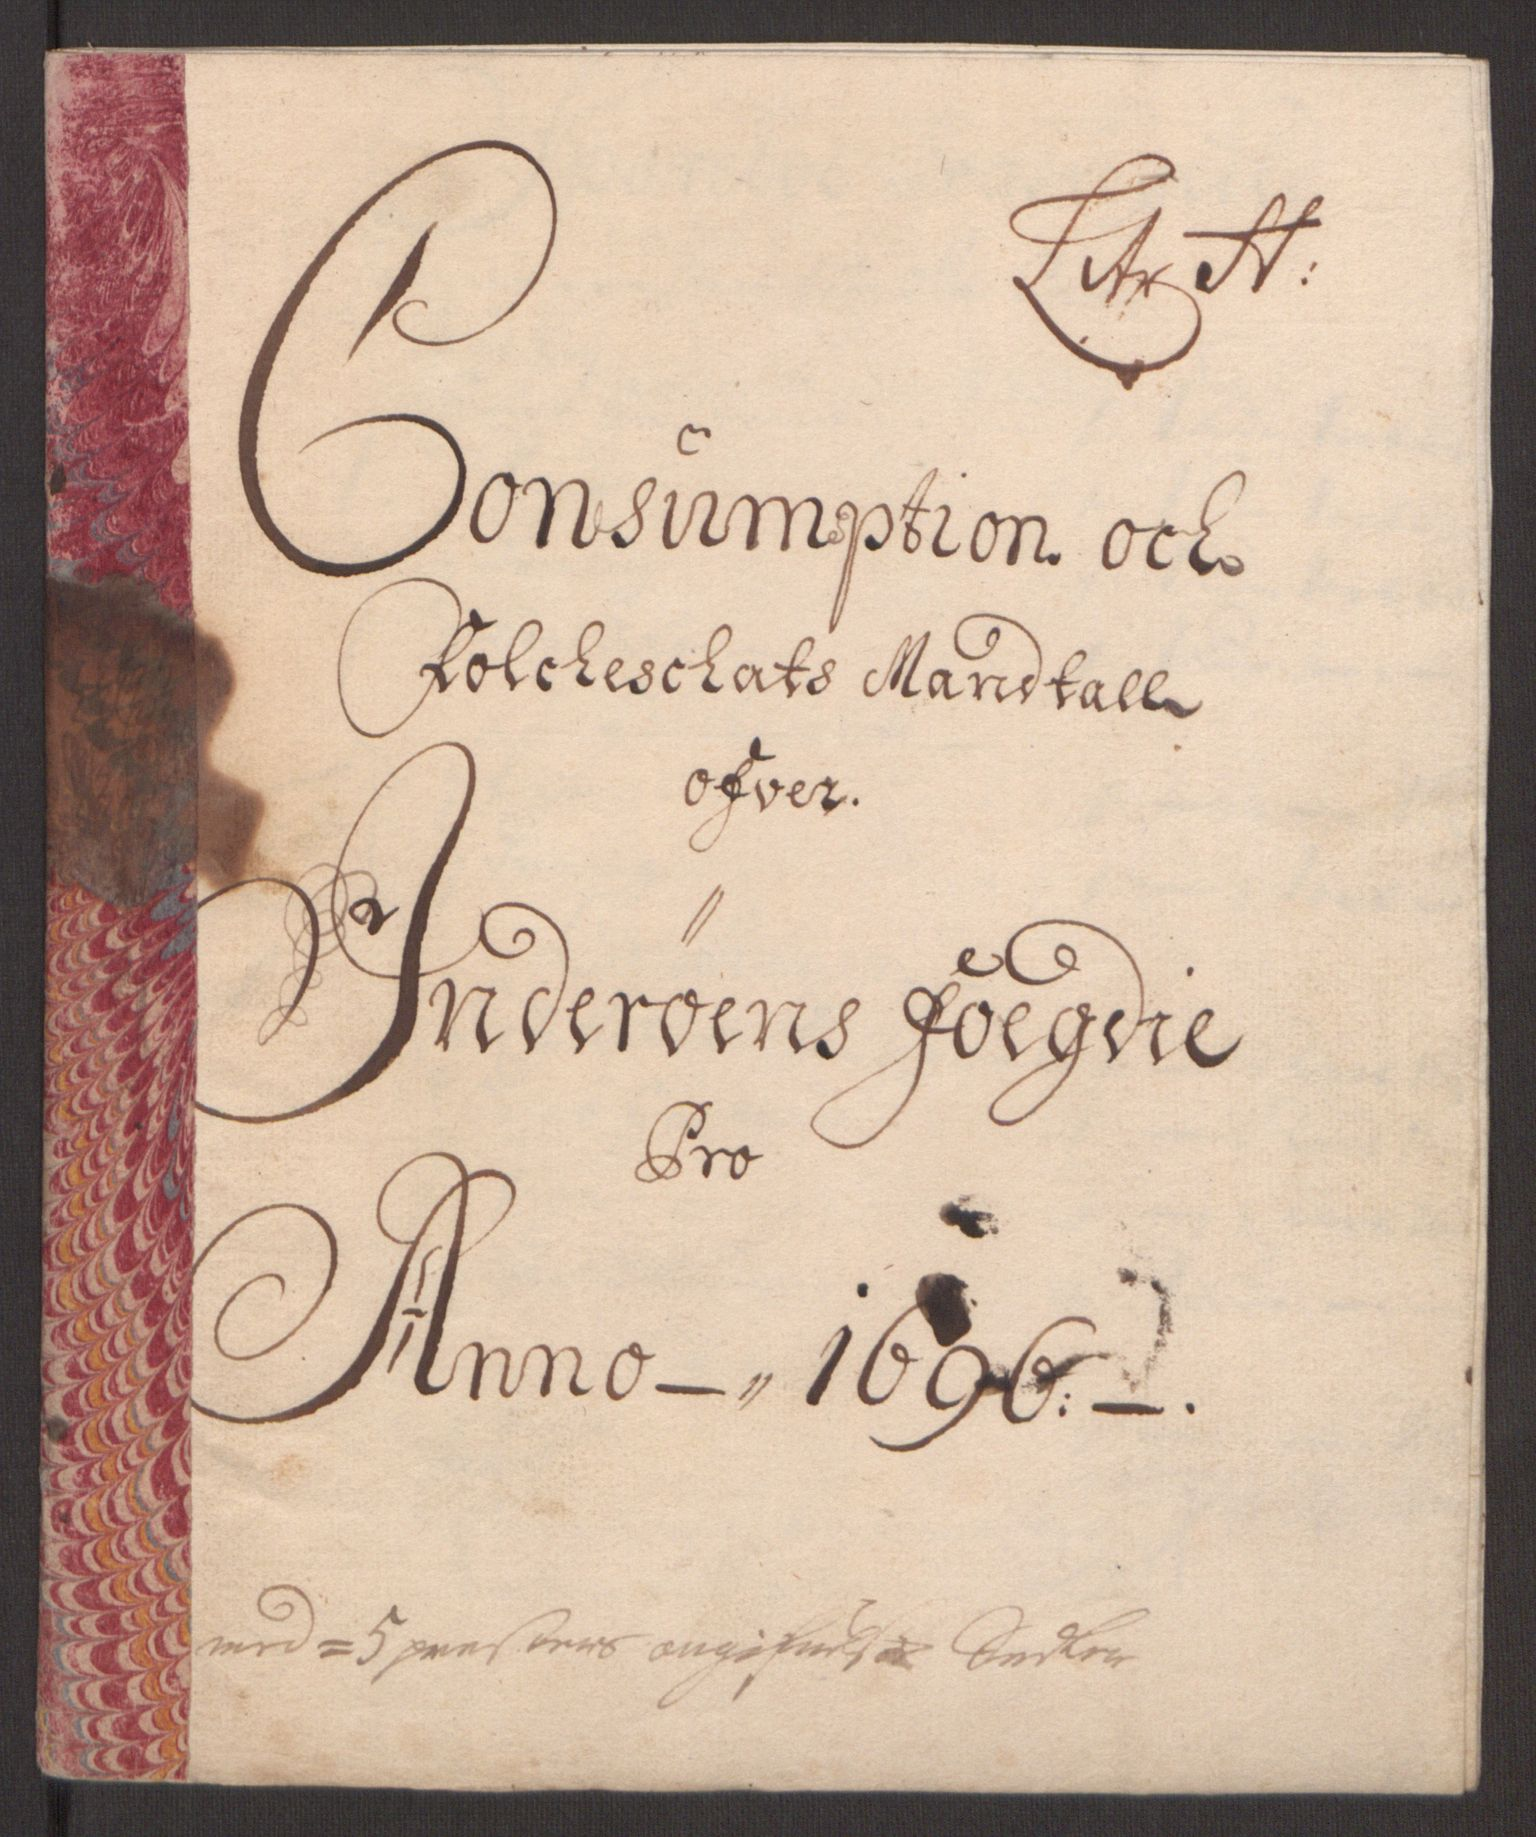 RA, Rentekammeret inntil 1814, Reviderte regnskaper, Fogderegnskap, R63/L4309: Fogderegnskap Inderøy, 1695-1697, s. 281